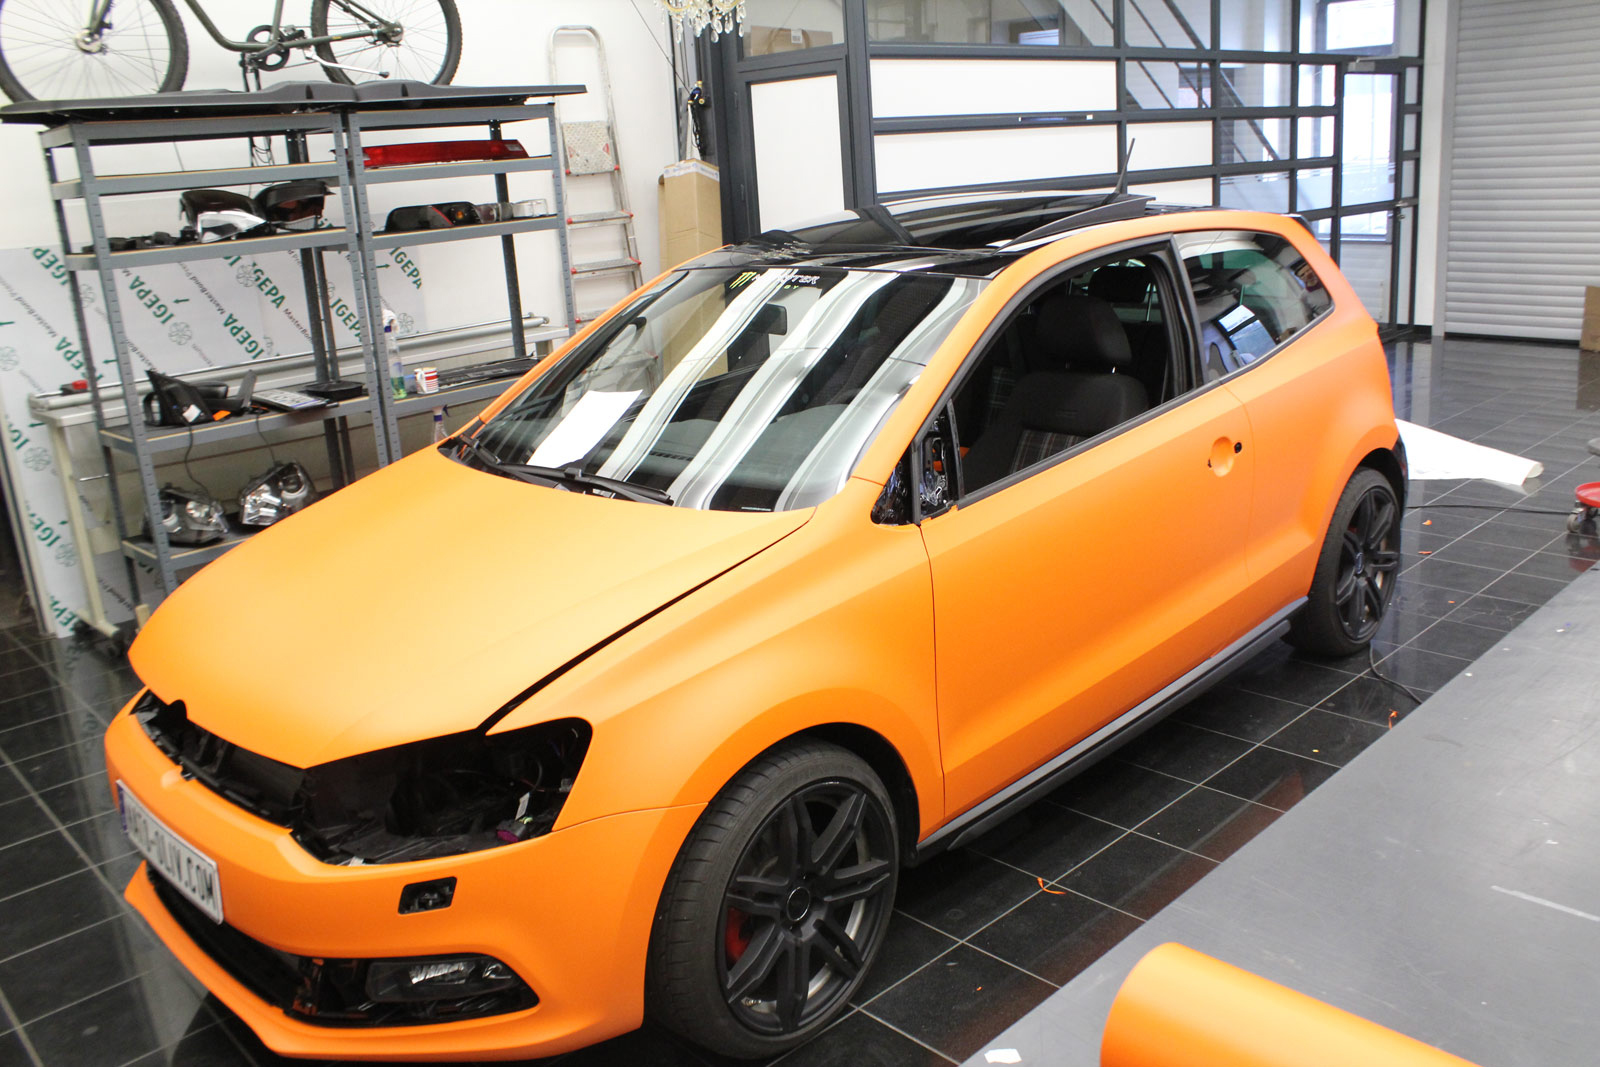 VW_Polo_GTI_Folierung_Orange_Matt_12